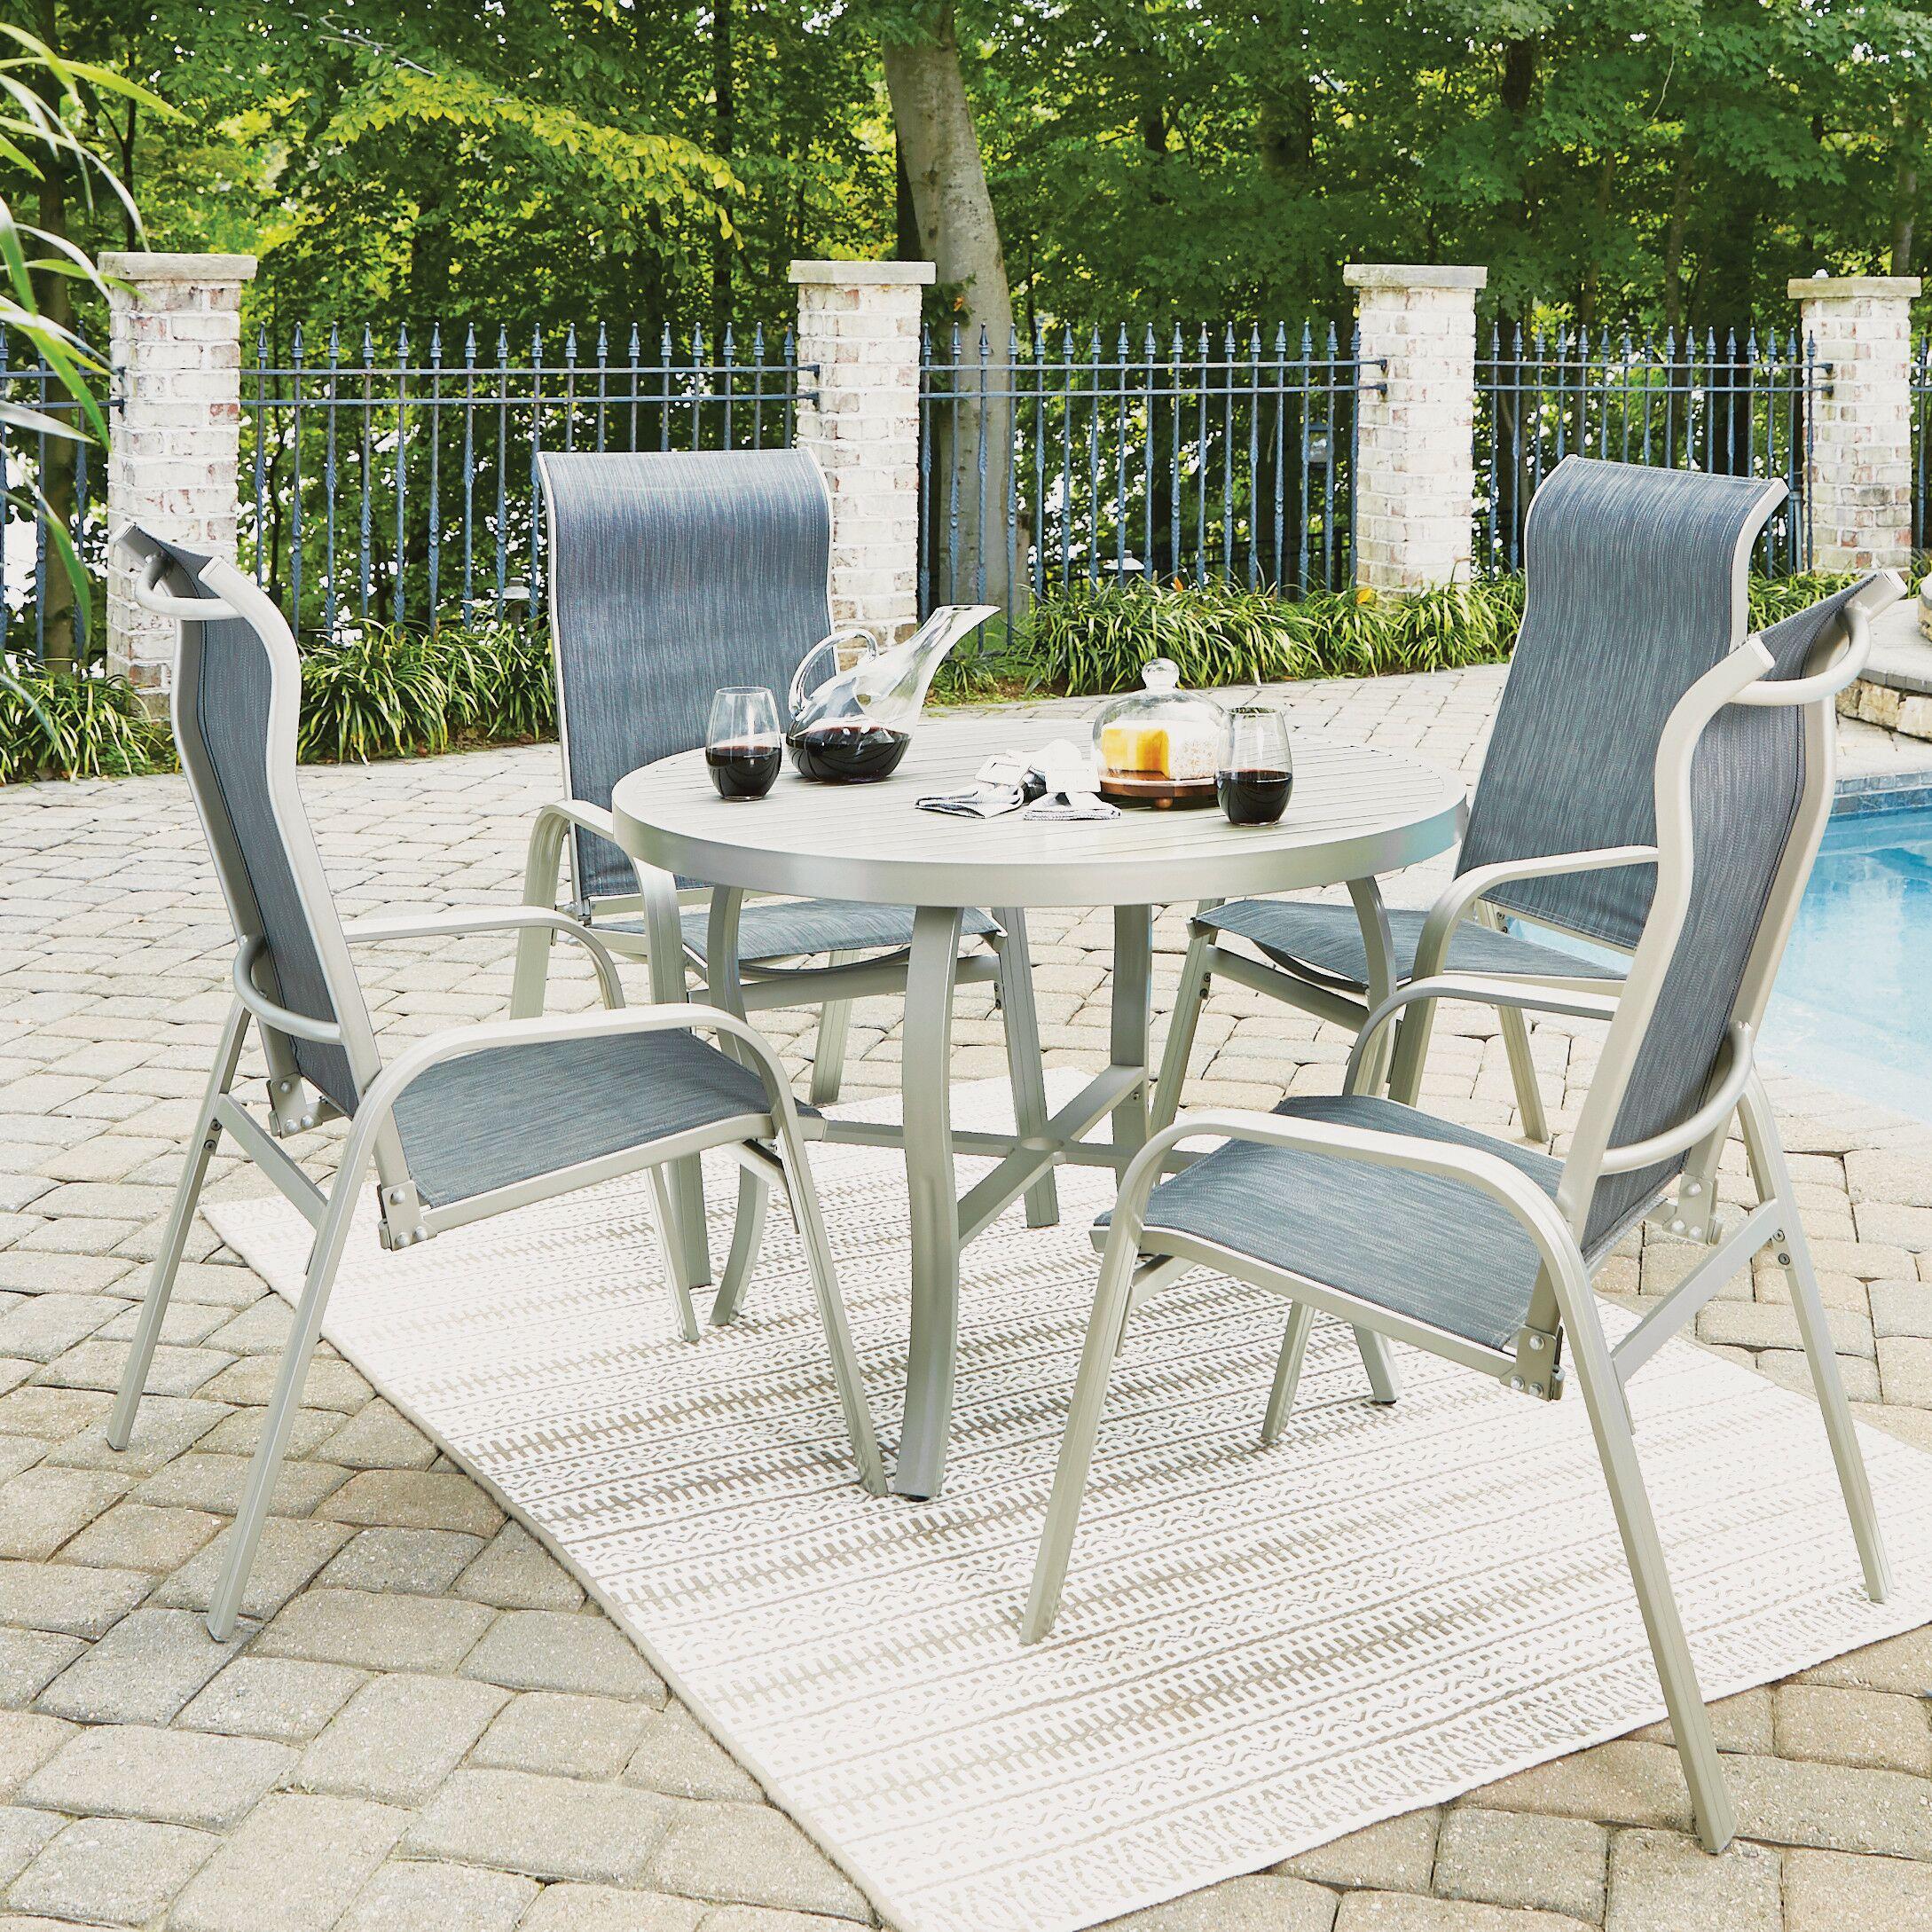 Dinan Outdoor 5 Piece Dining Set Table Size: 28.75